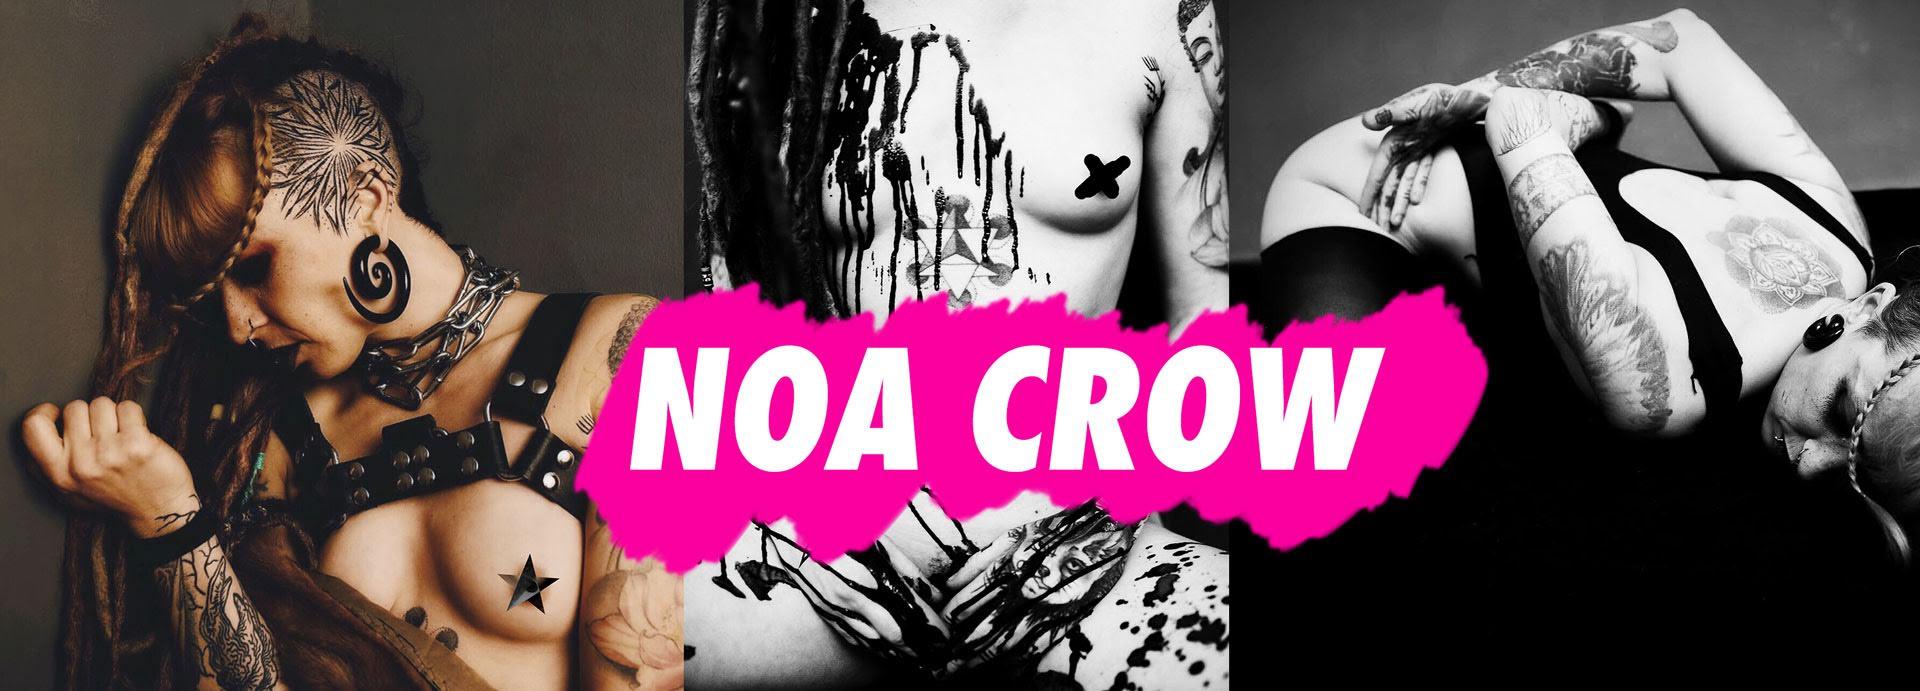 Noa Crow Latex